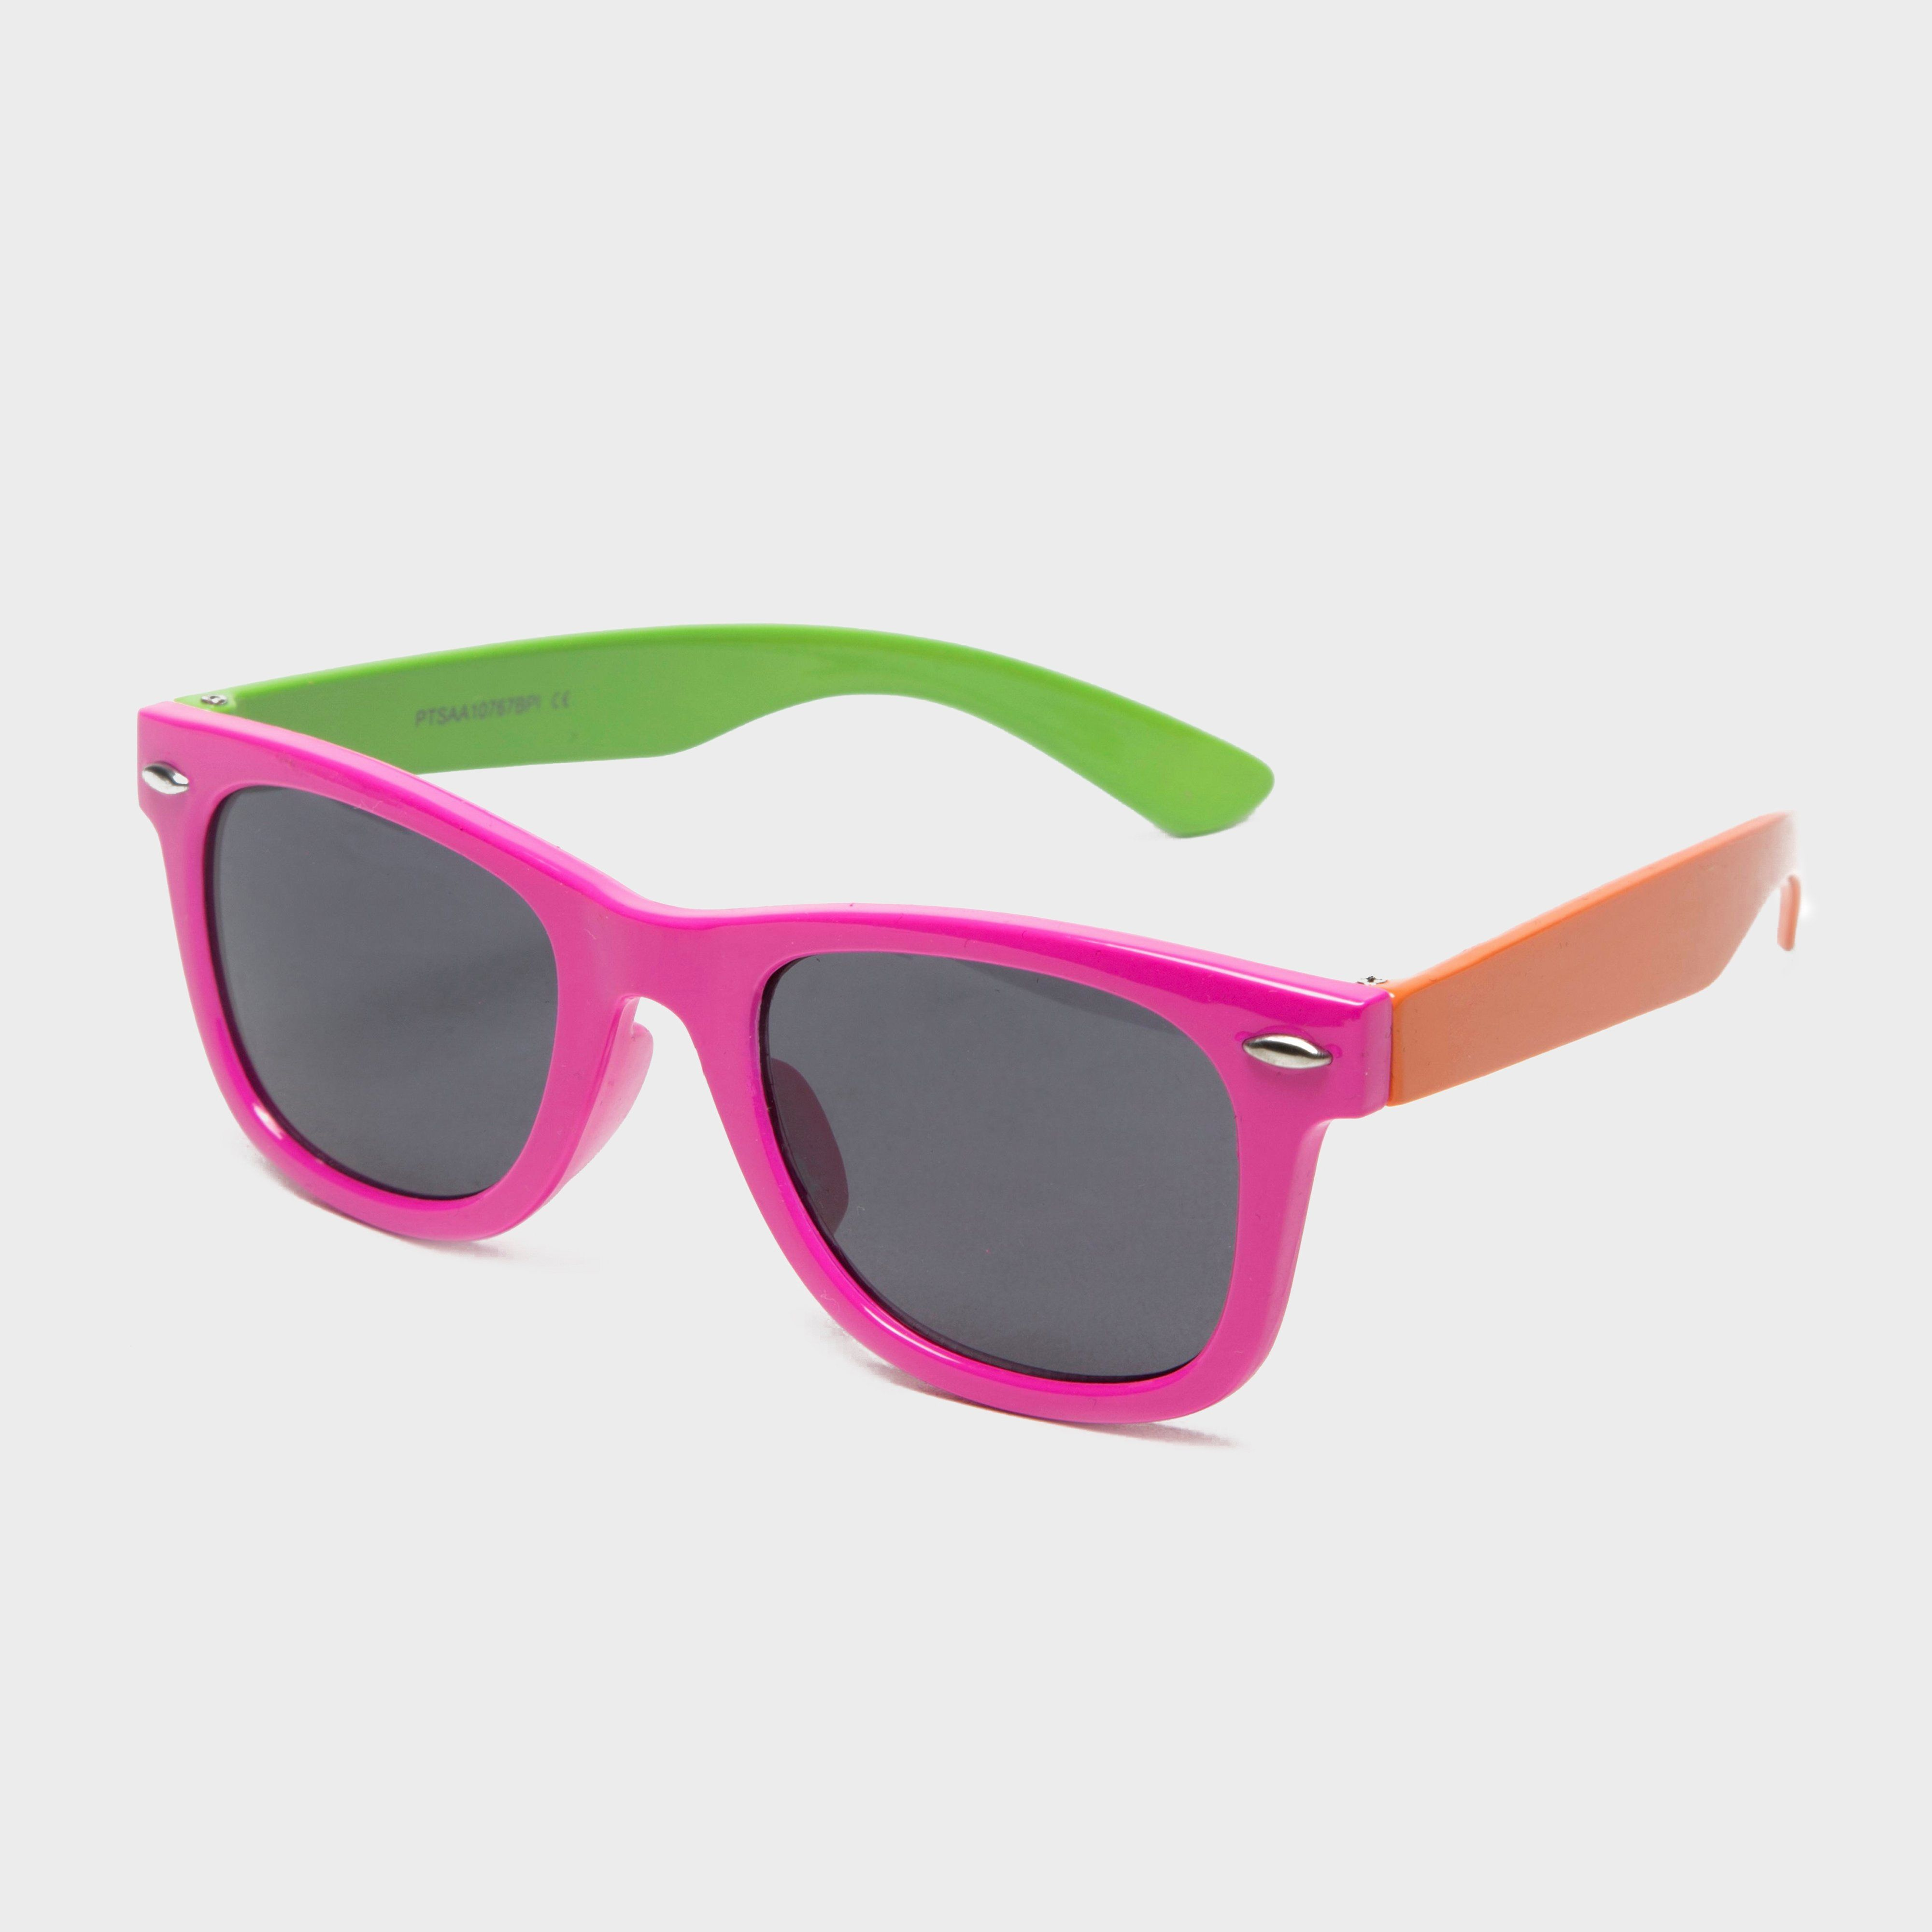 PETER STORM Girls' Multi-Coloured Sunglasses